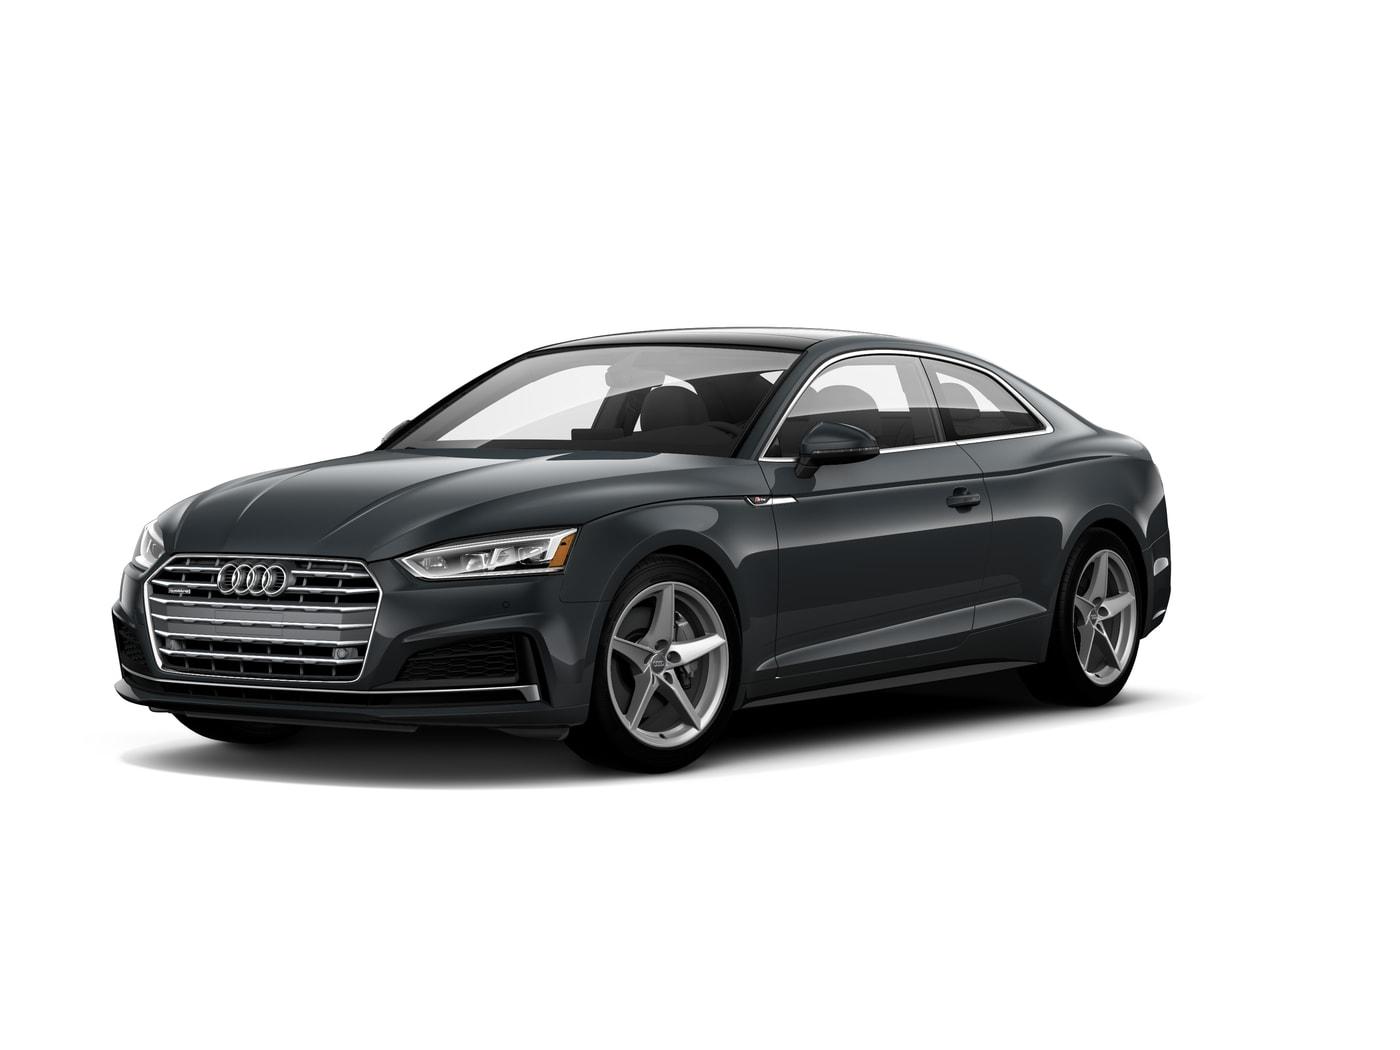 Audi of minneapolis